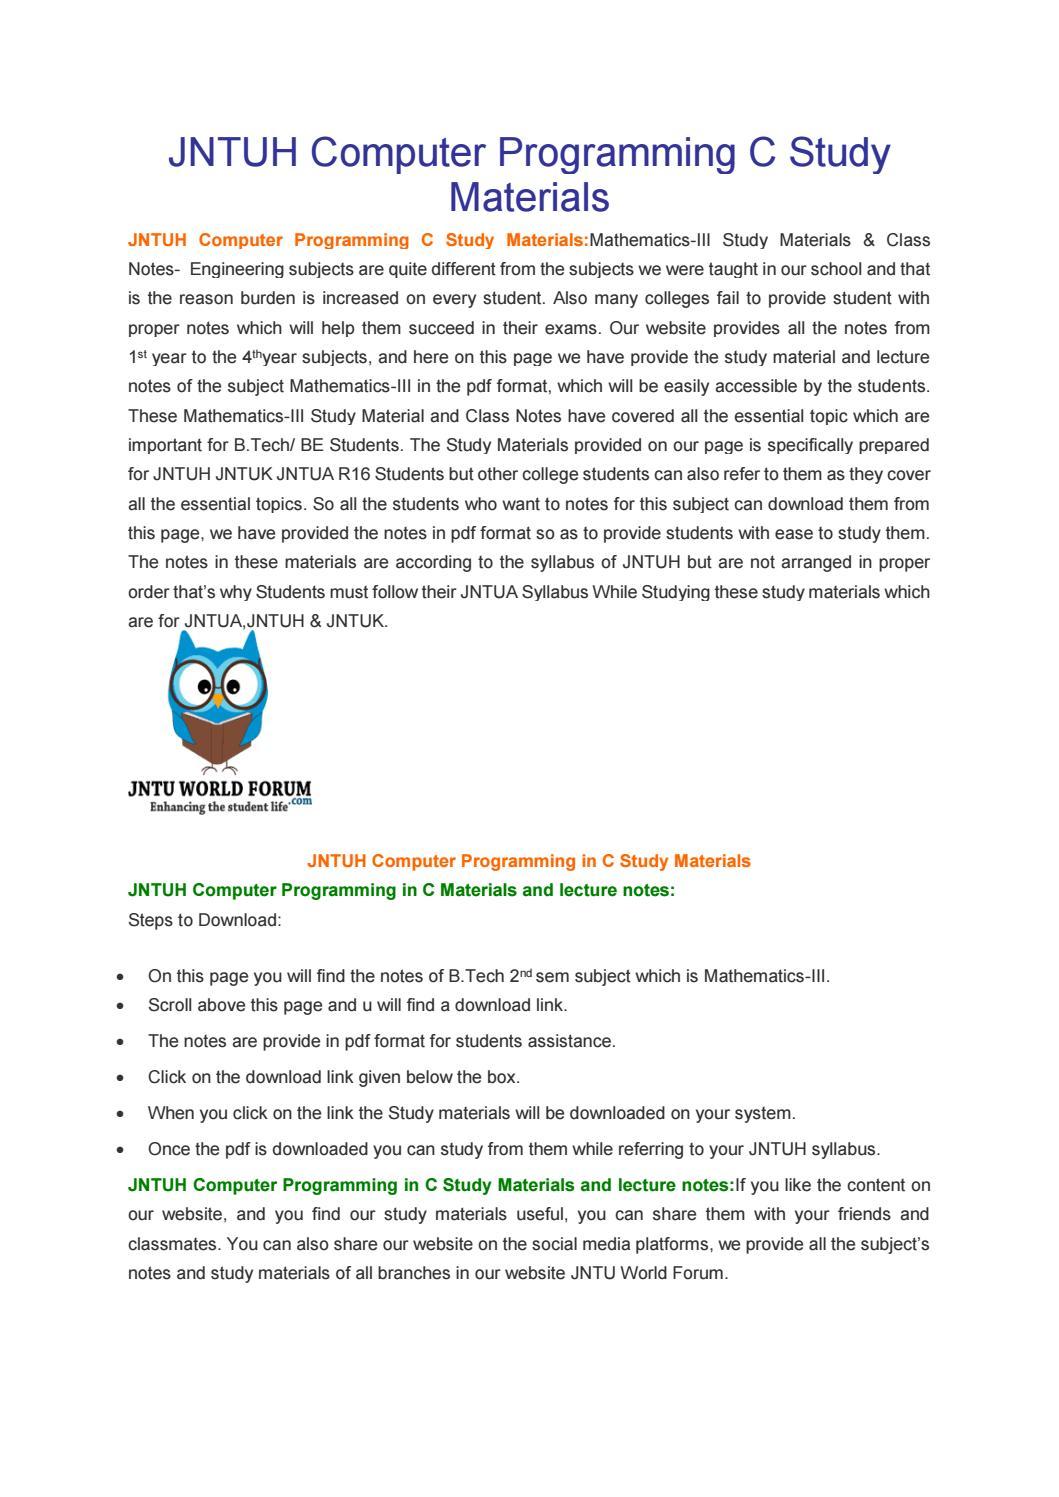 JNTUH Computer Programming C Study Materials by Owlpure - issuu